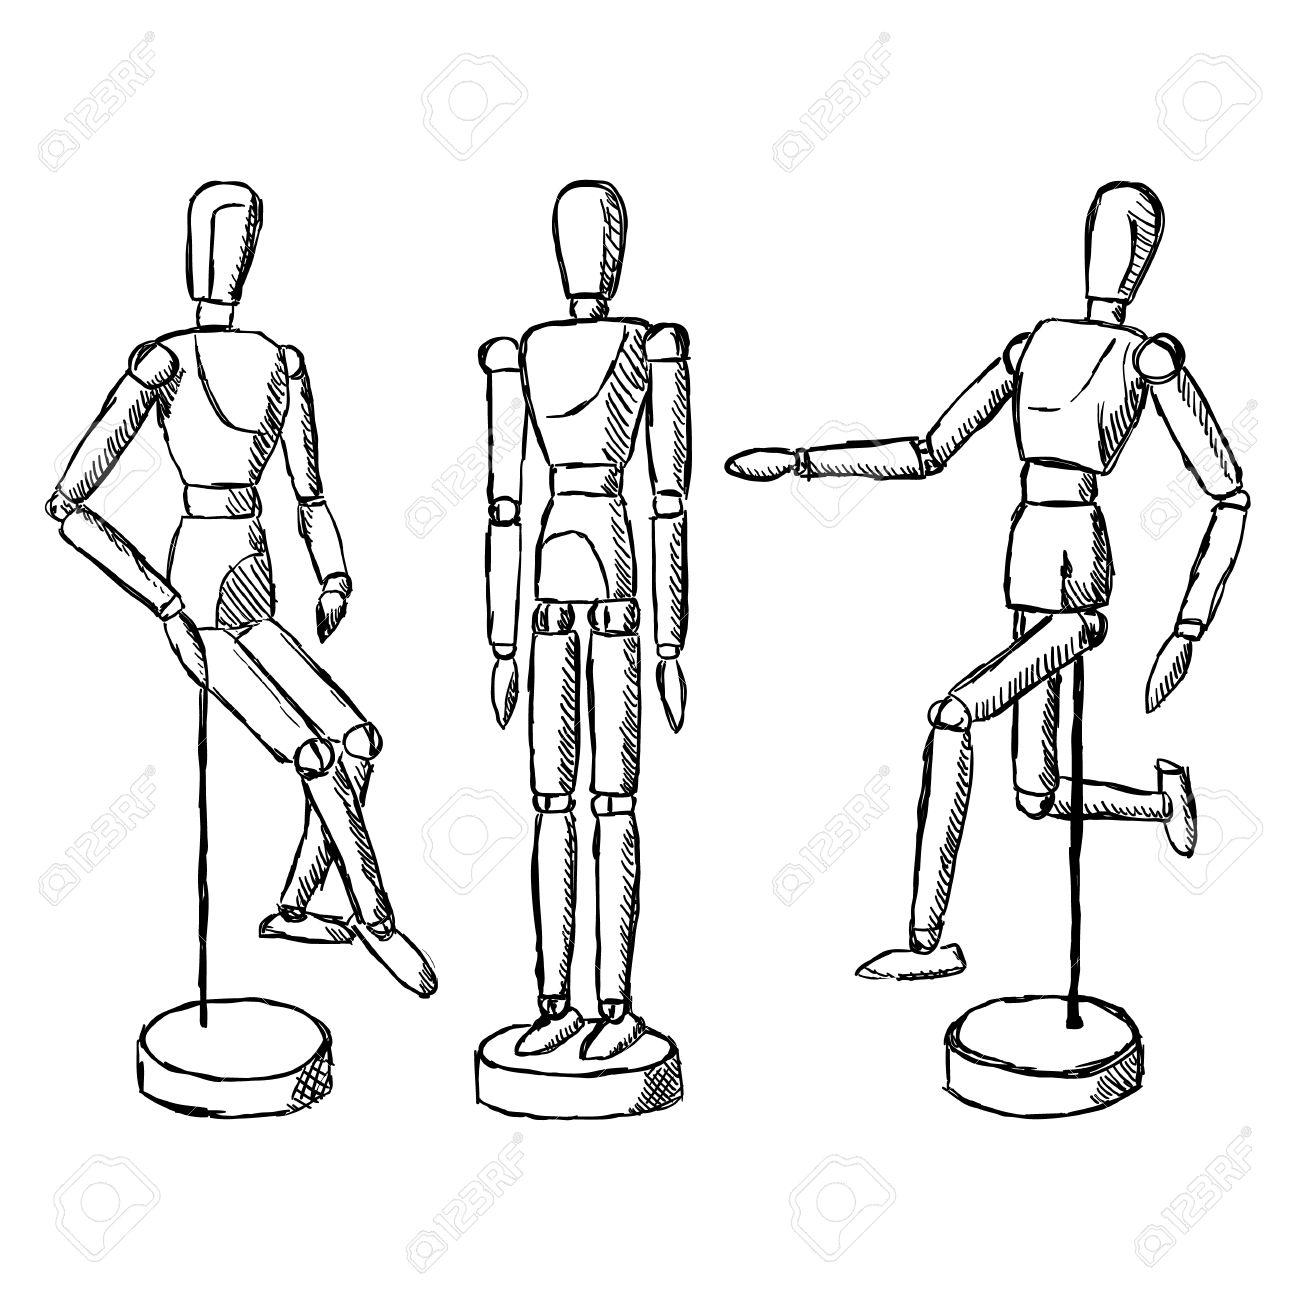 wooden mannequin art figurine